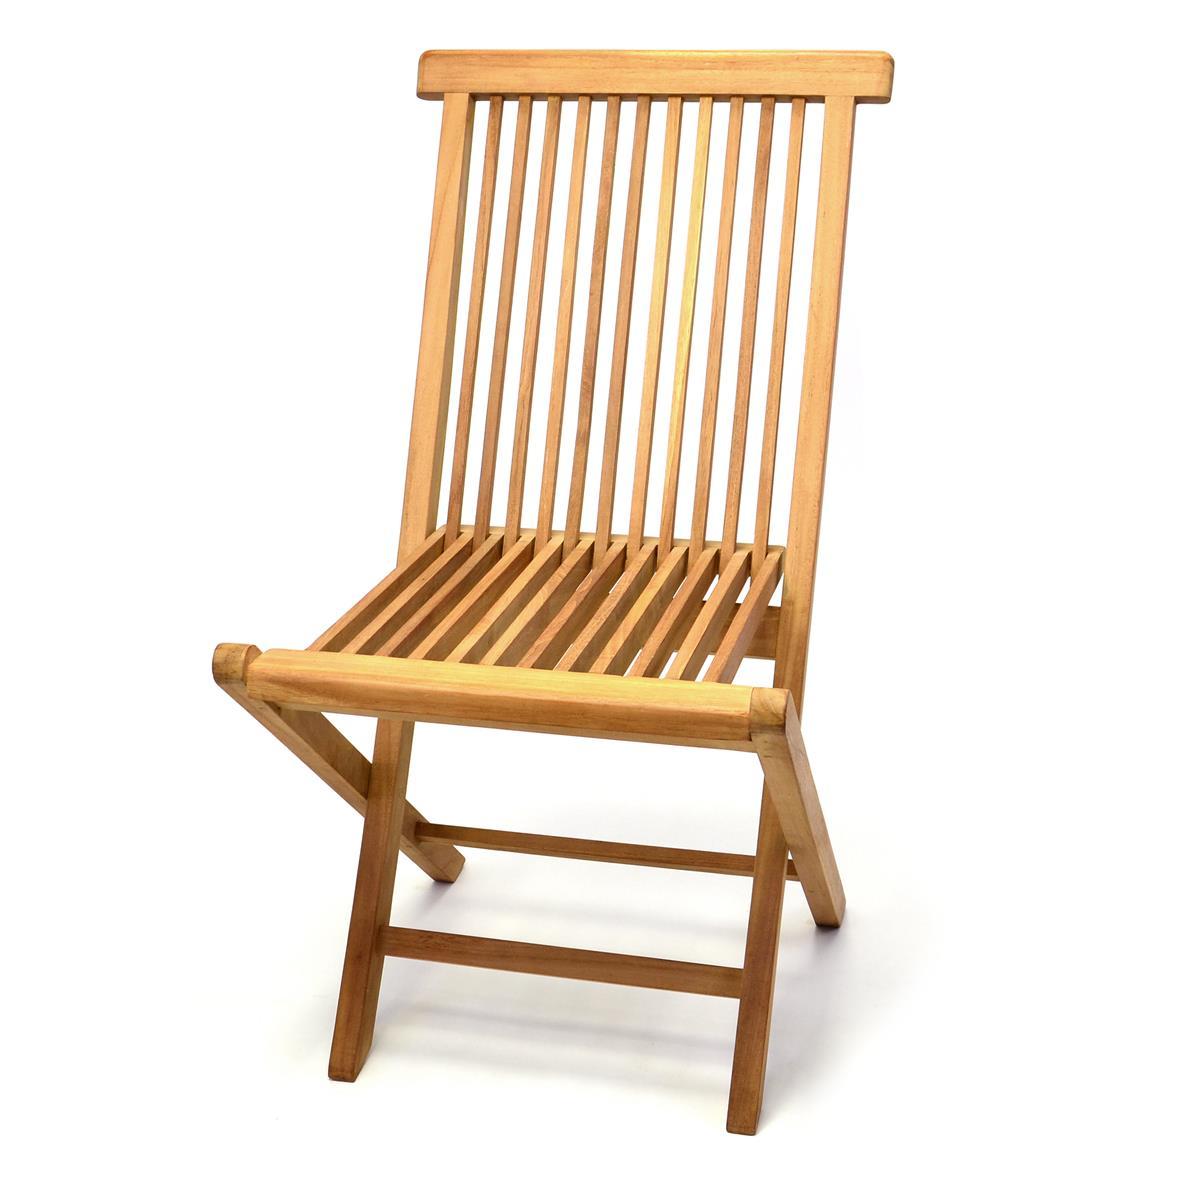 DIVERO Gartenstuhl Teak Holz klappbar massiv Holzstuhl Balkonstuhl behandelt